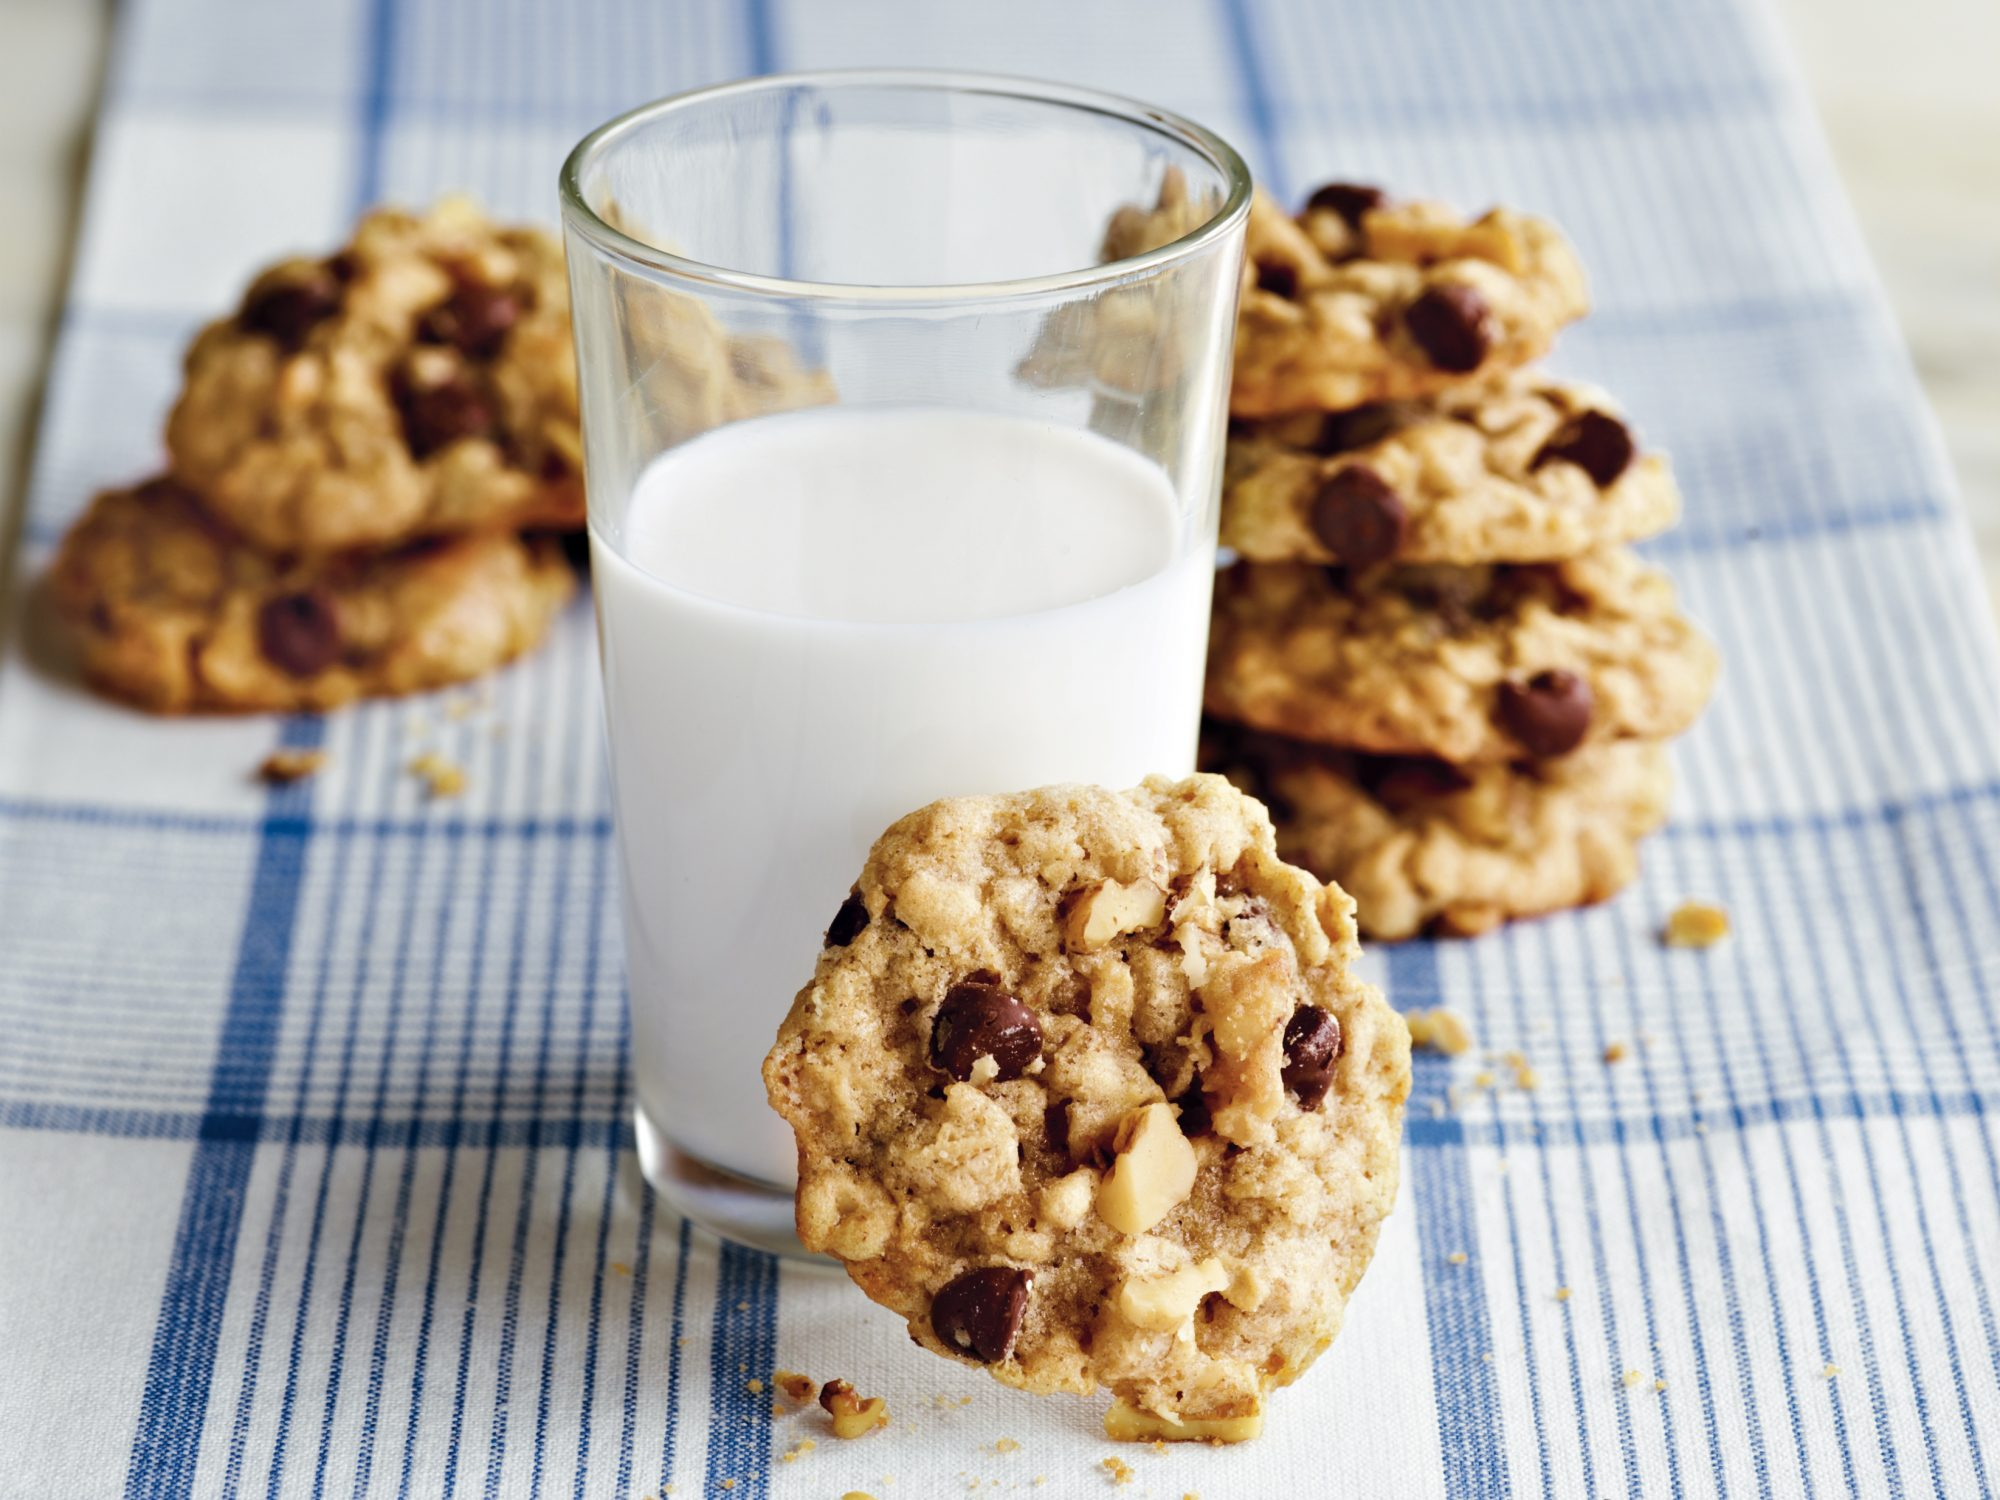 Kitchen Sink Oatmeal Cookies